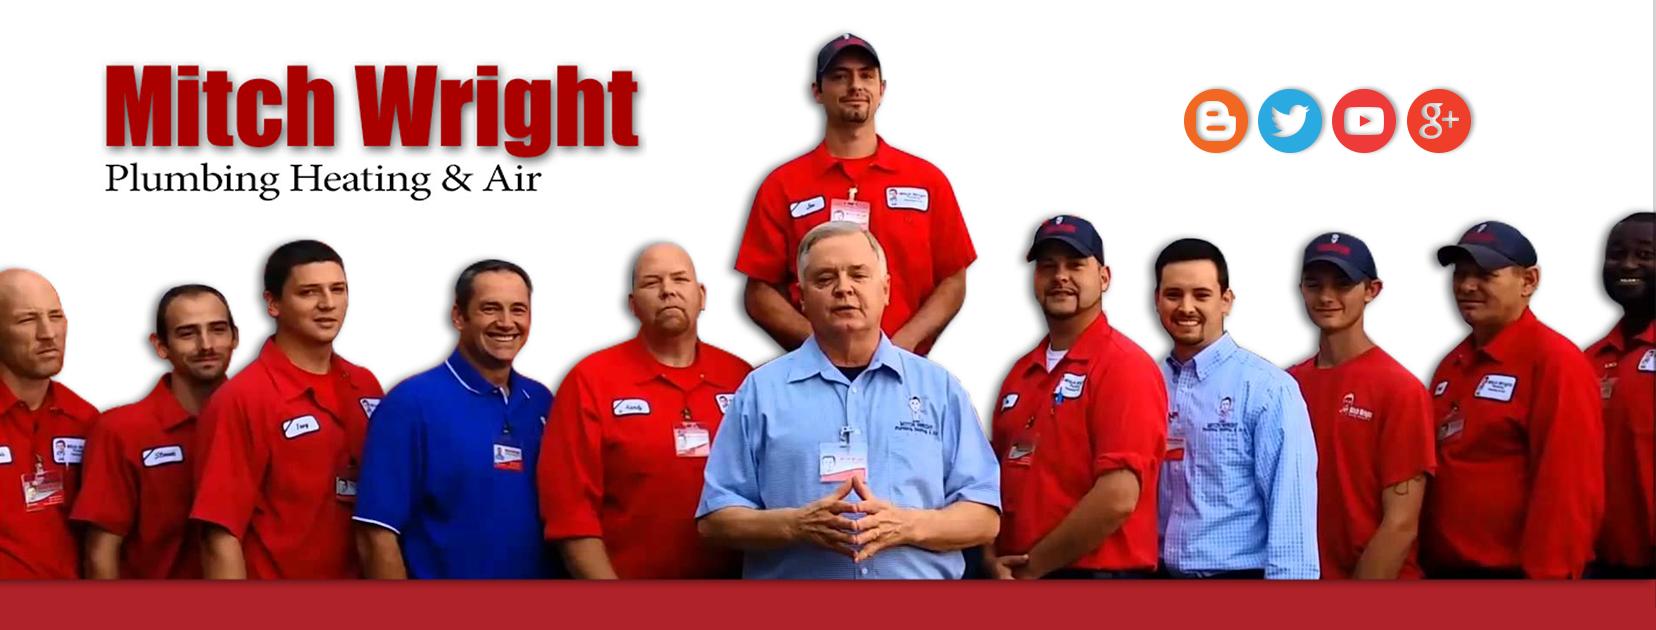 Mitch Wright Plumbing, Heating & Air image 1